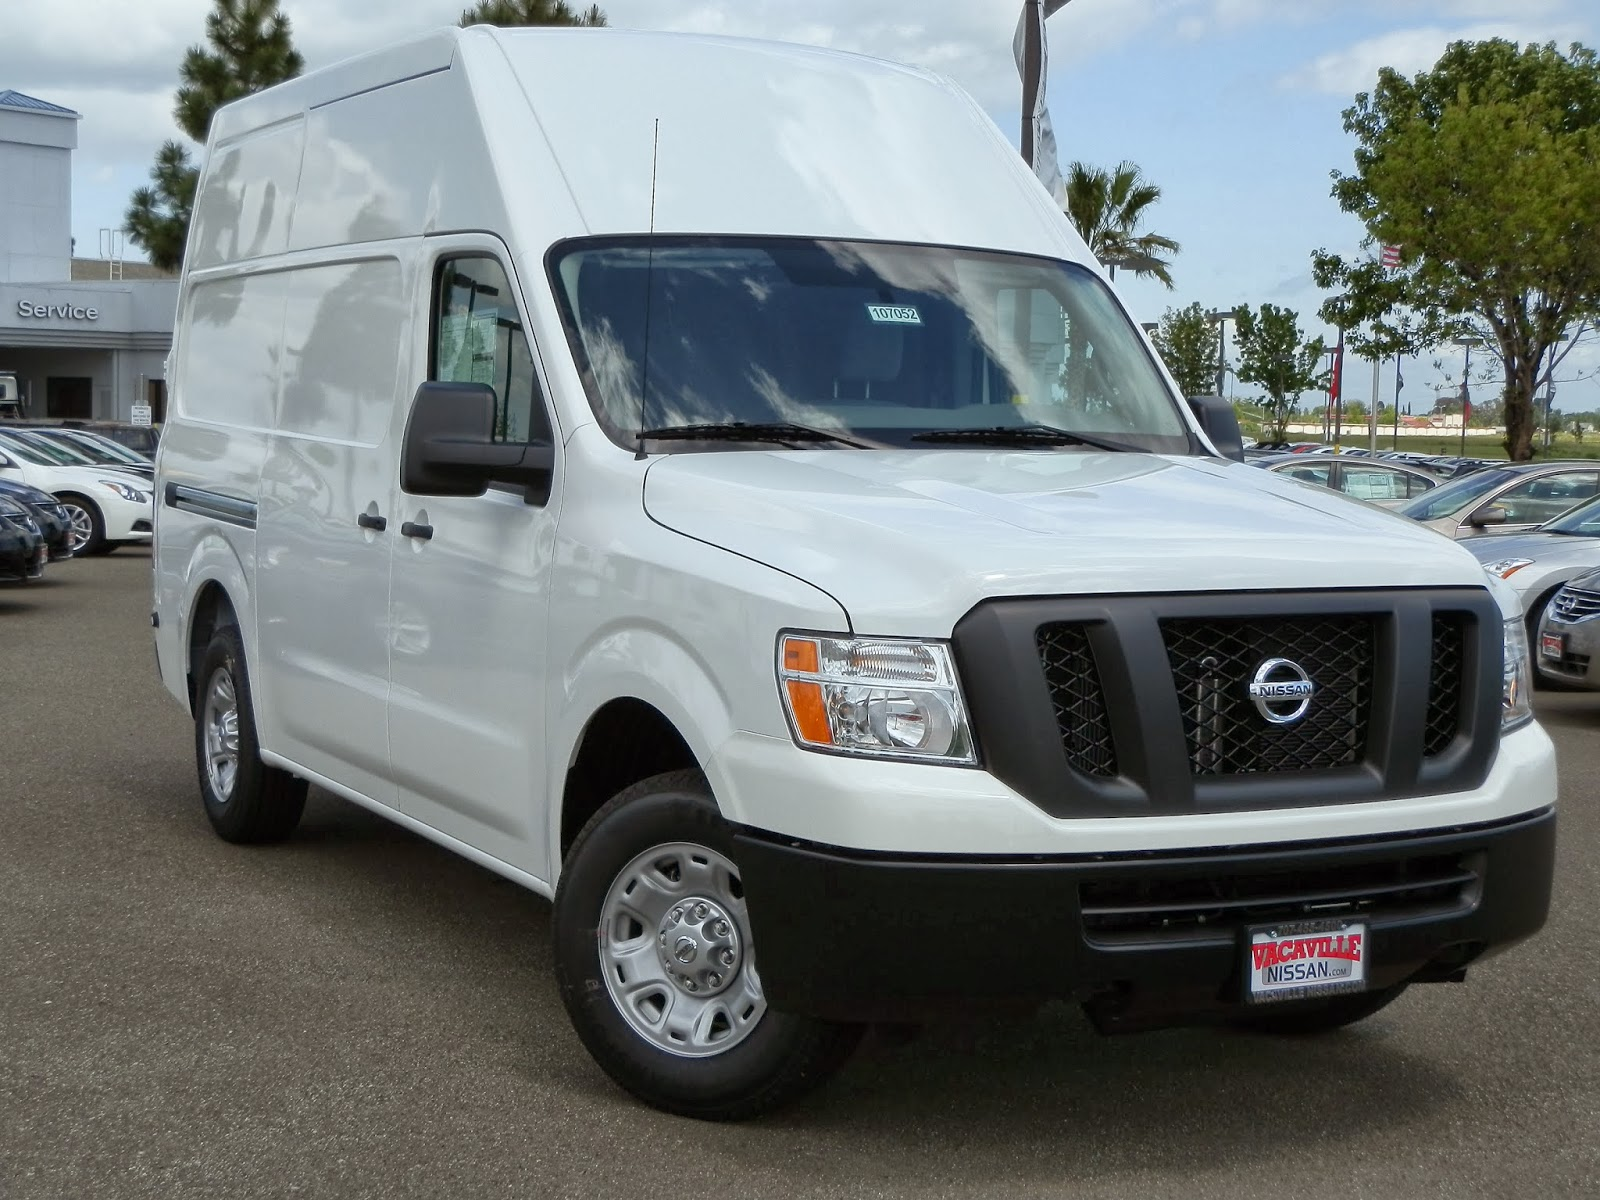 Vacaville Nissan Fleet: Vacaville Nissan NV Cargo Van of ...